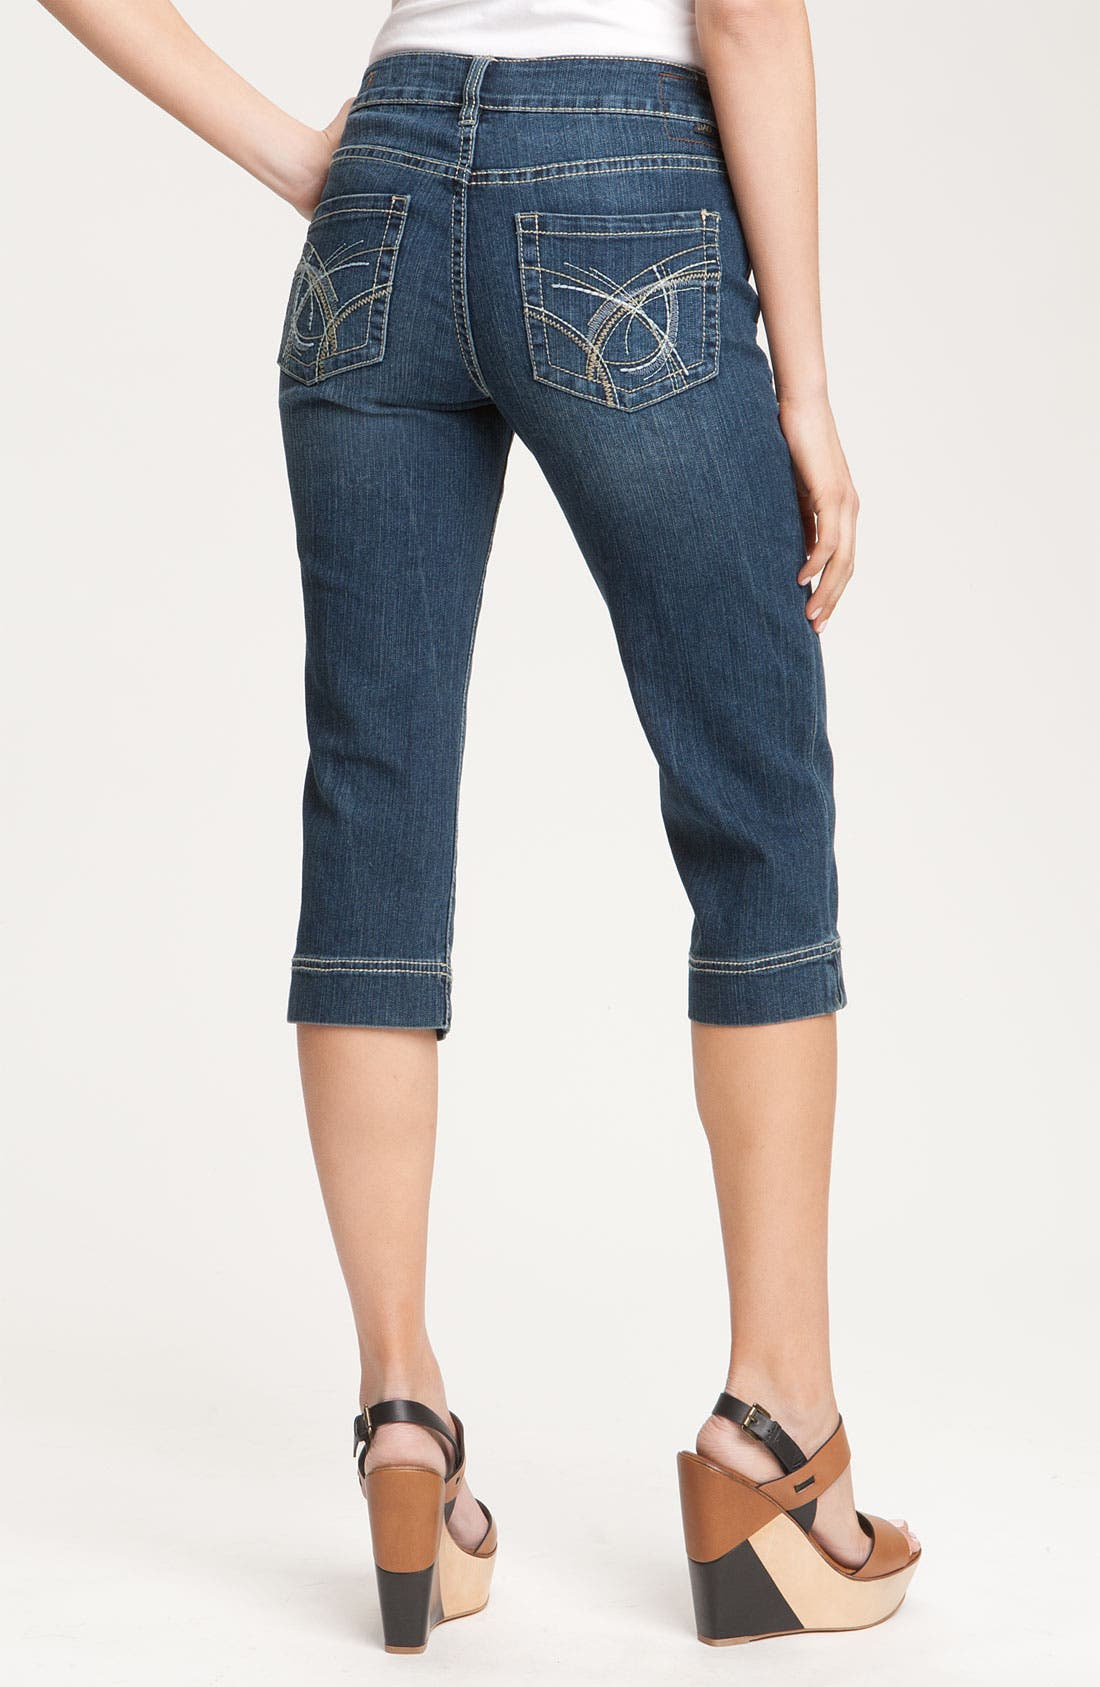 Alternate Image 1 Selected - Jag Jeans 'Selma' Crop Jeans (Petite)